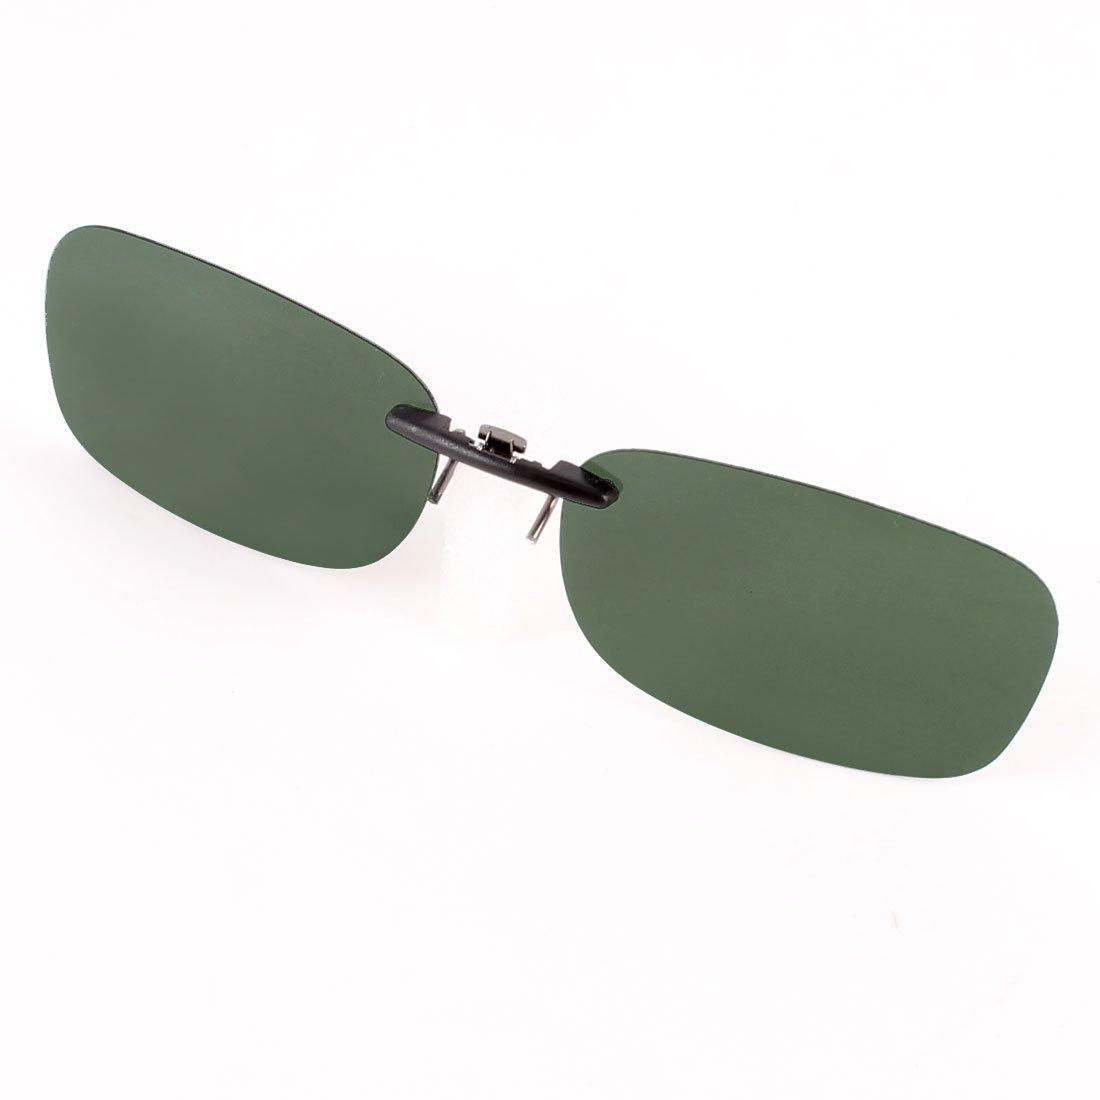 Sunshade Rectangle Rimless Dark Green Lens Clip on Polarized Sunglasses DealMux